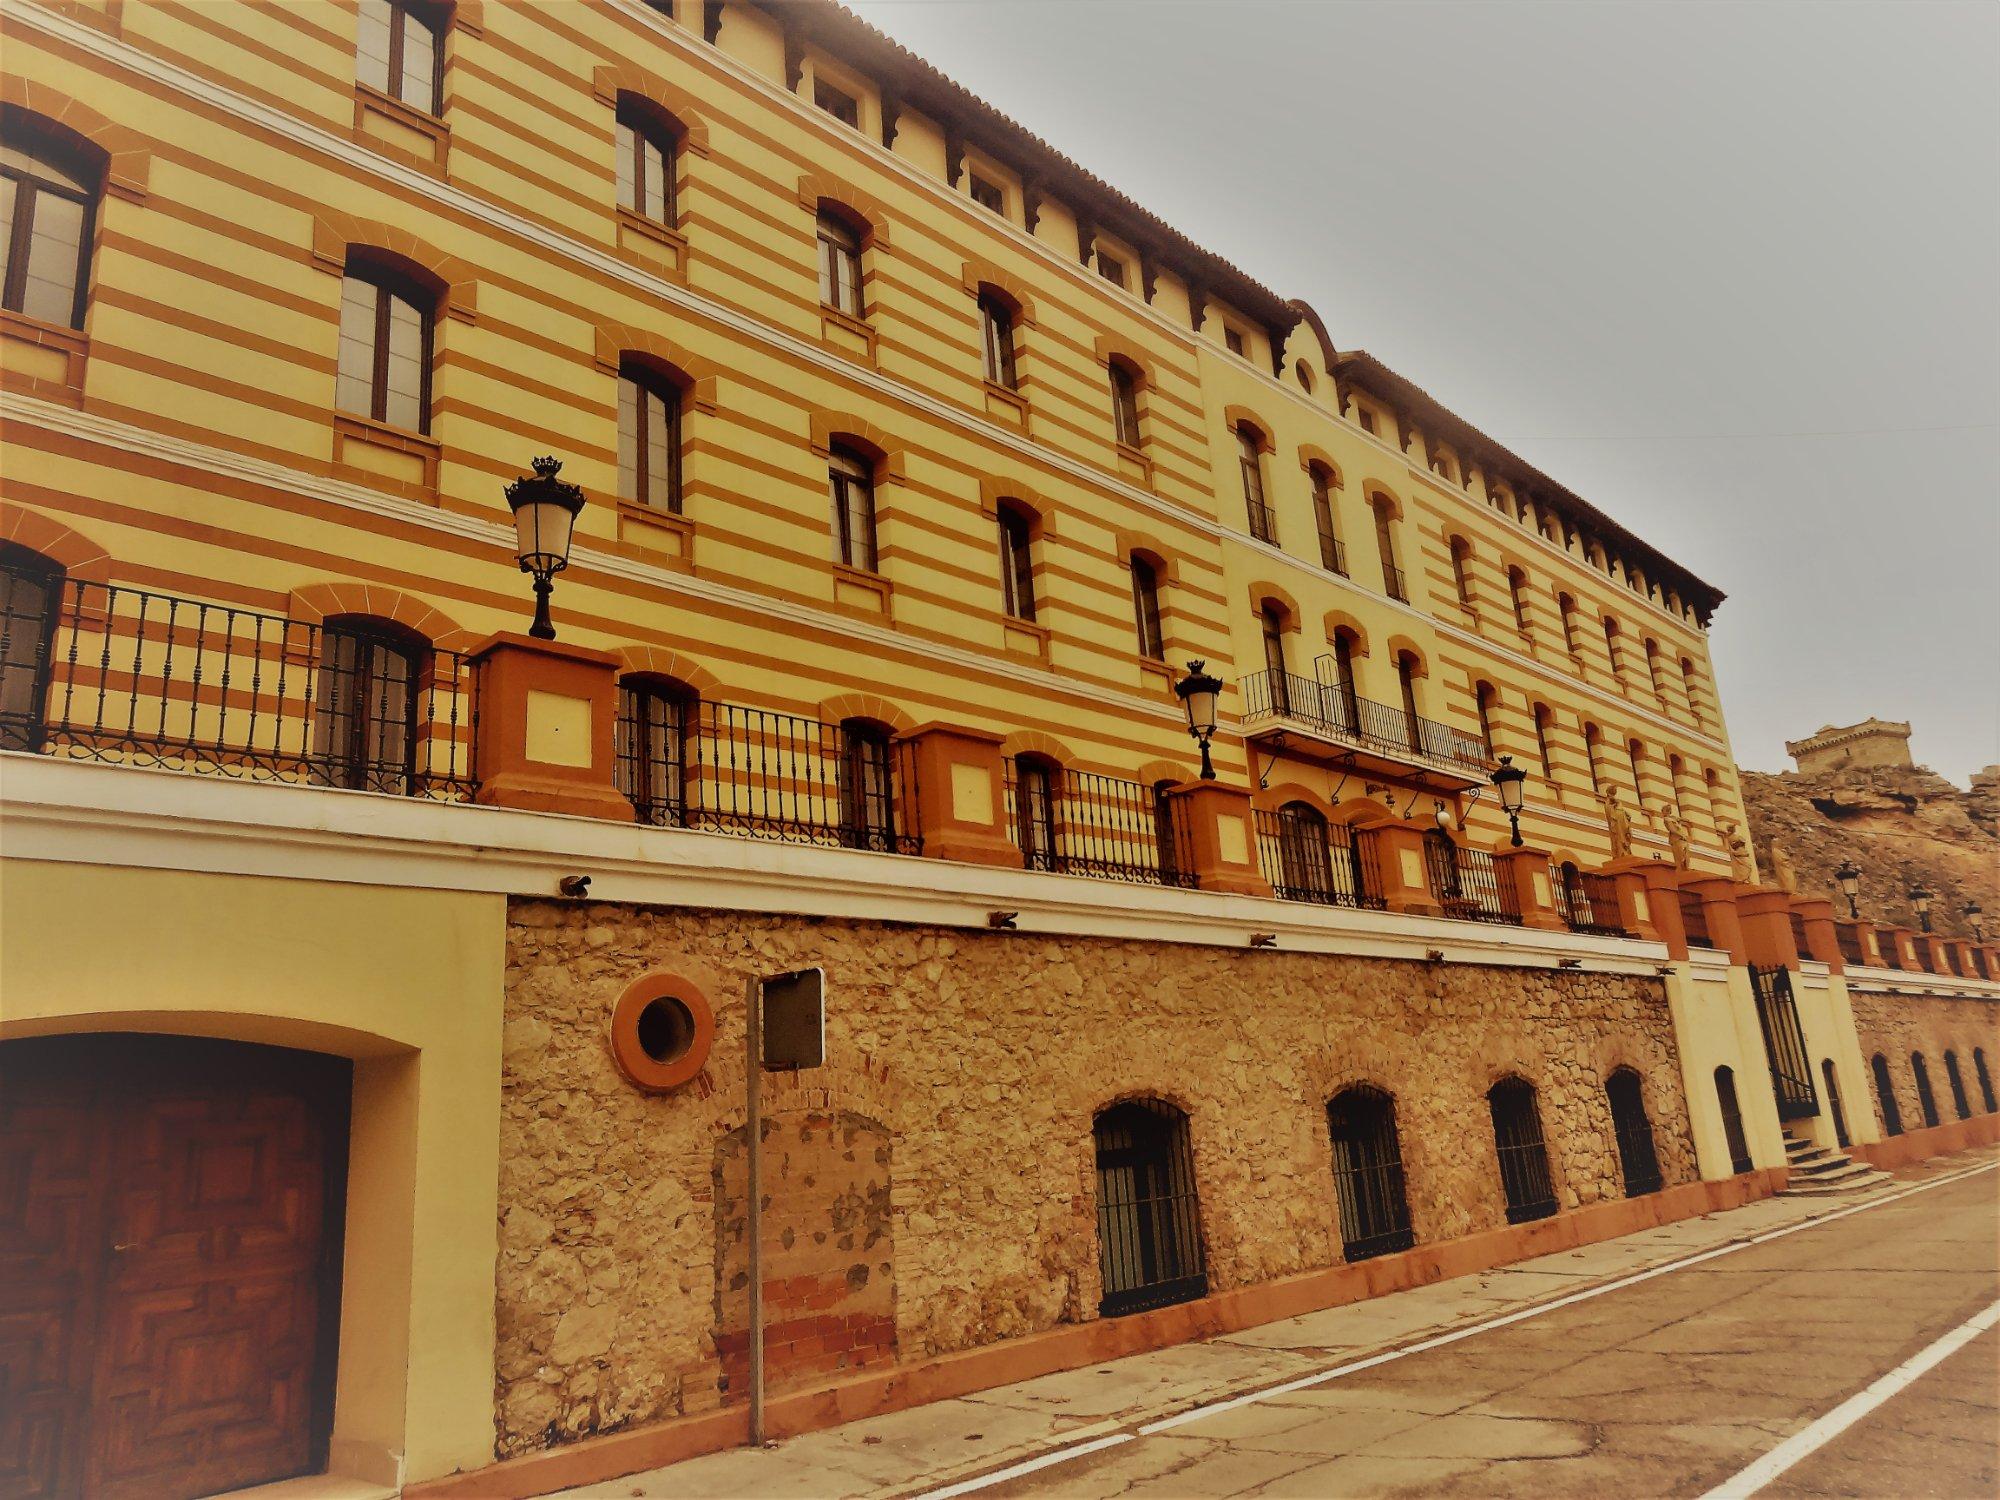 Balneario Termas Pallares - Hotel Parque